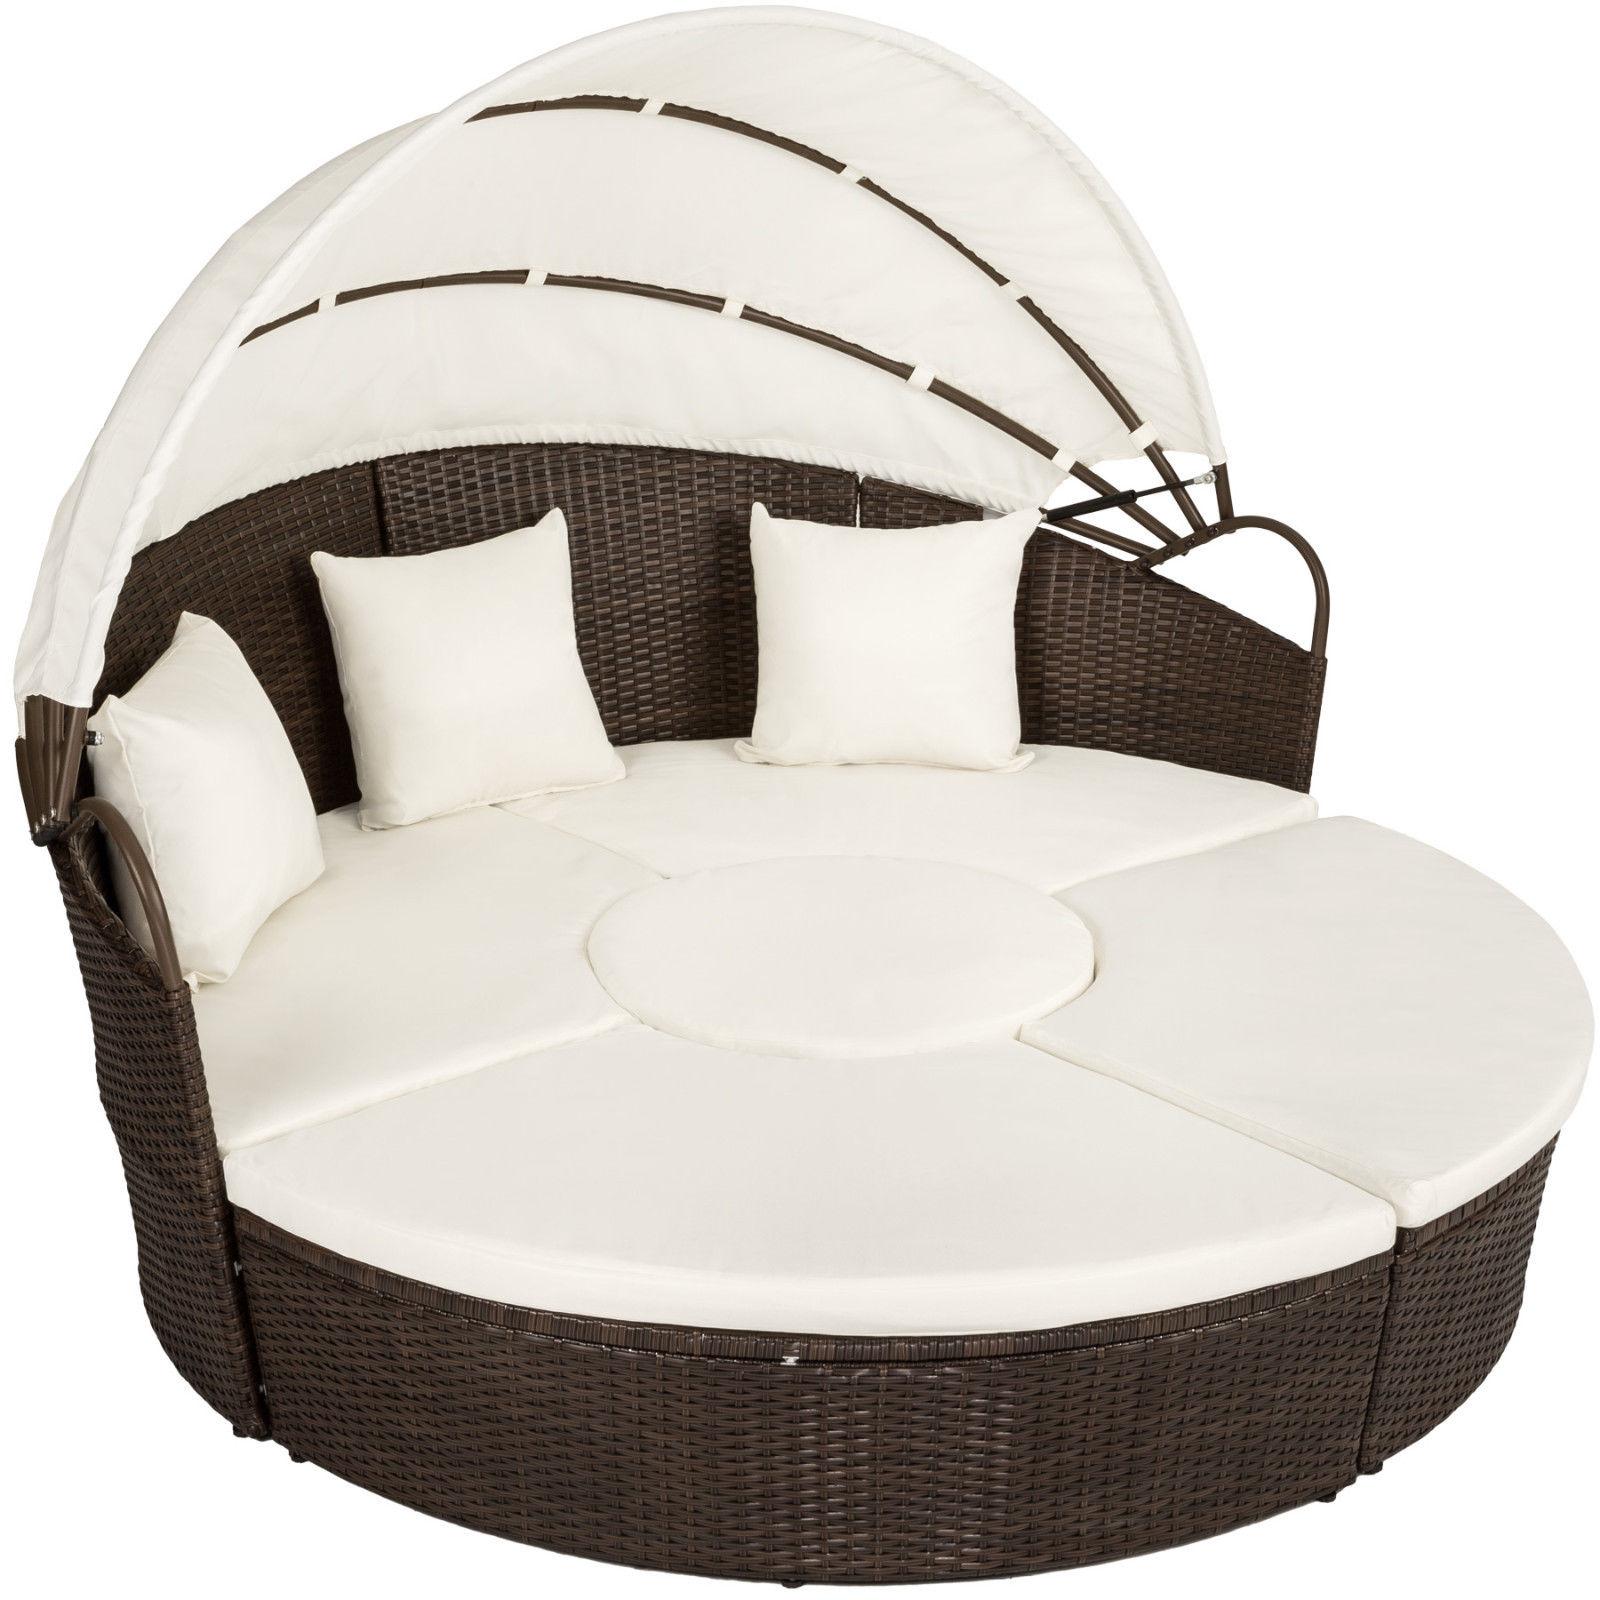 Alu rattan day mattress garden furnishings outdoor lounger sofa photo voltaic roof desk brown mi